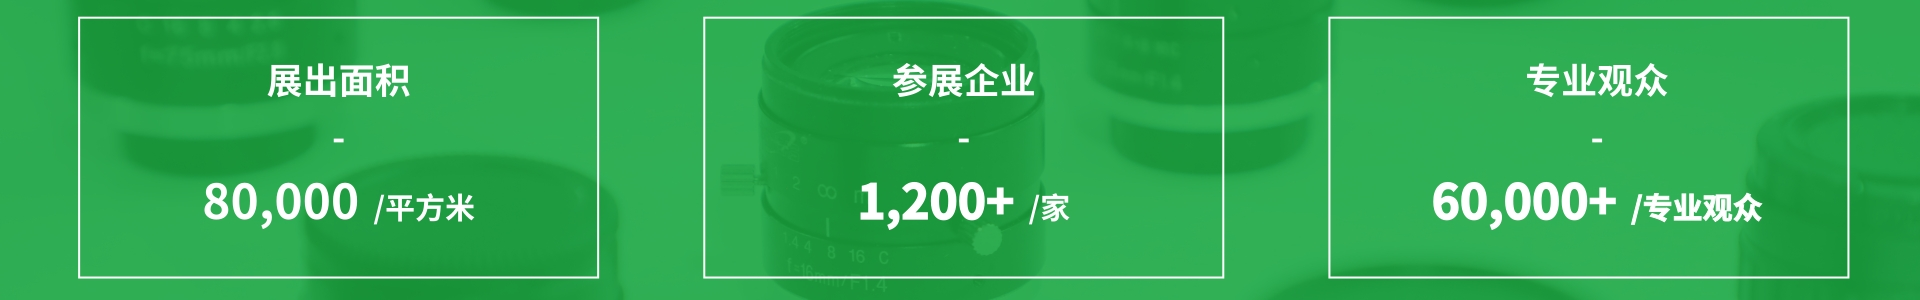 机器视觉官网banner0519.jpg